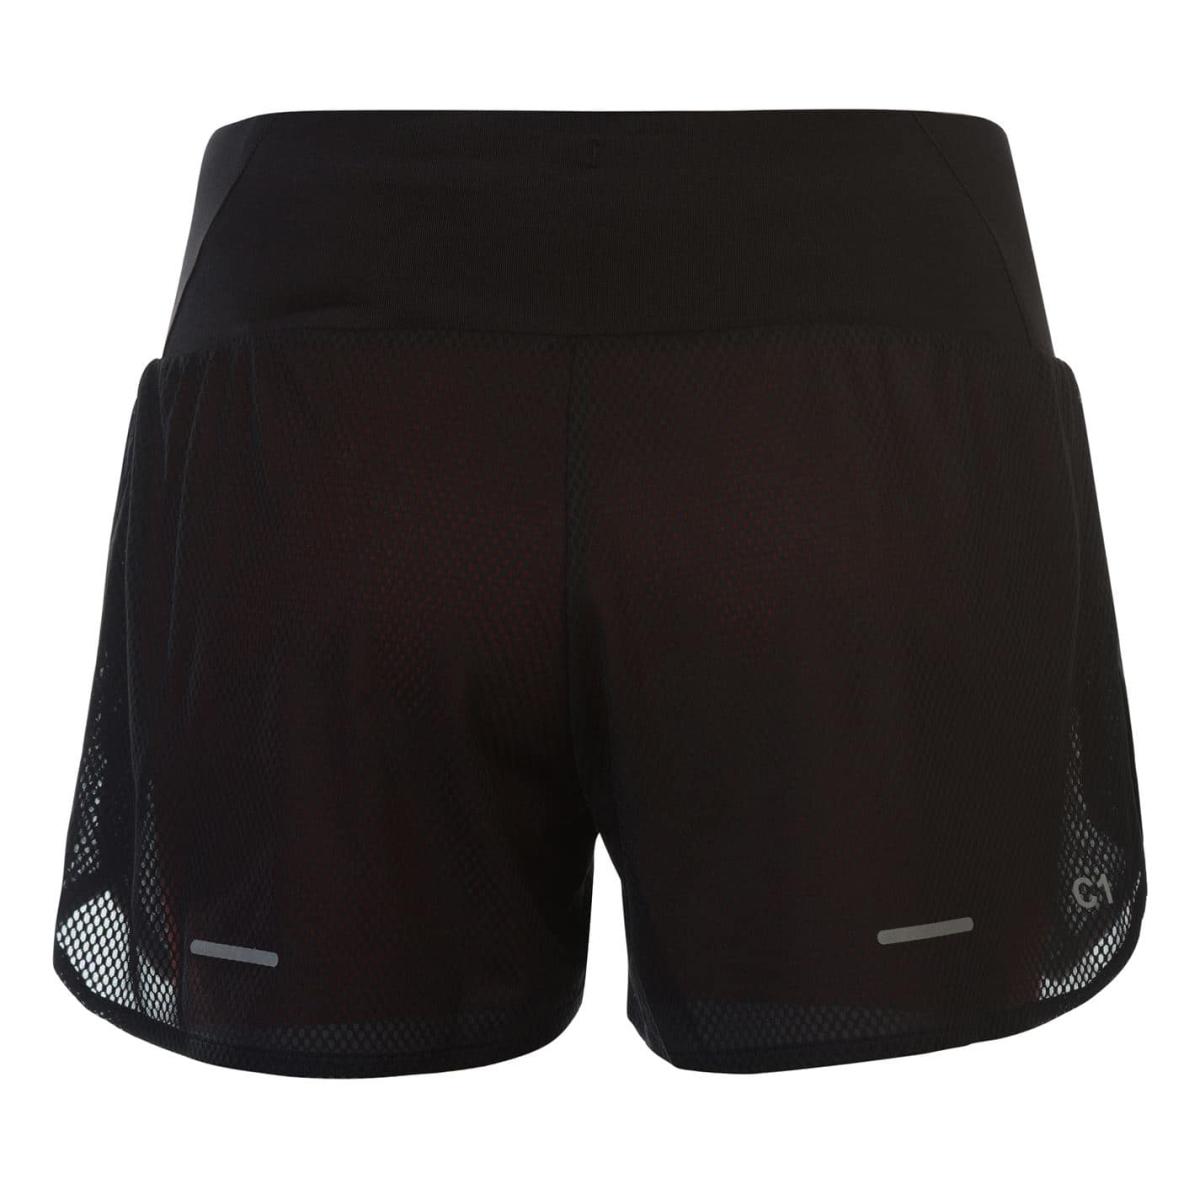 Asics Cool 2 In 1 Jogging Kurzhose Shorts Damen